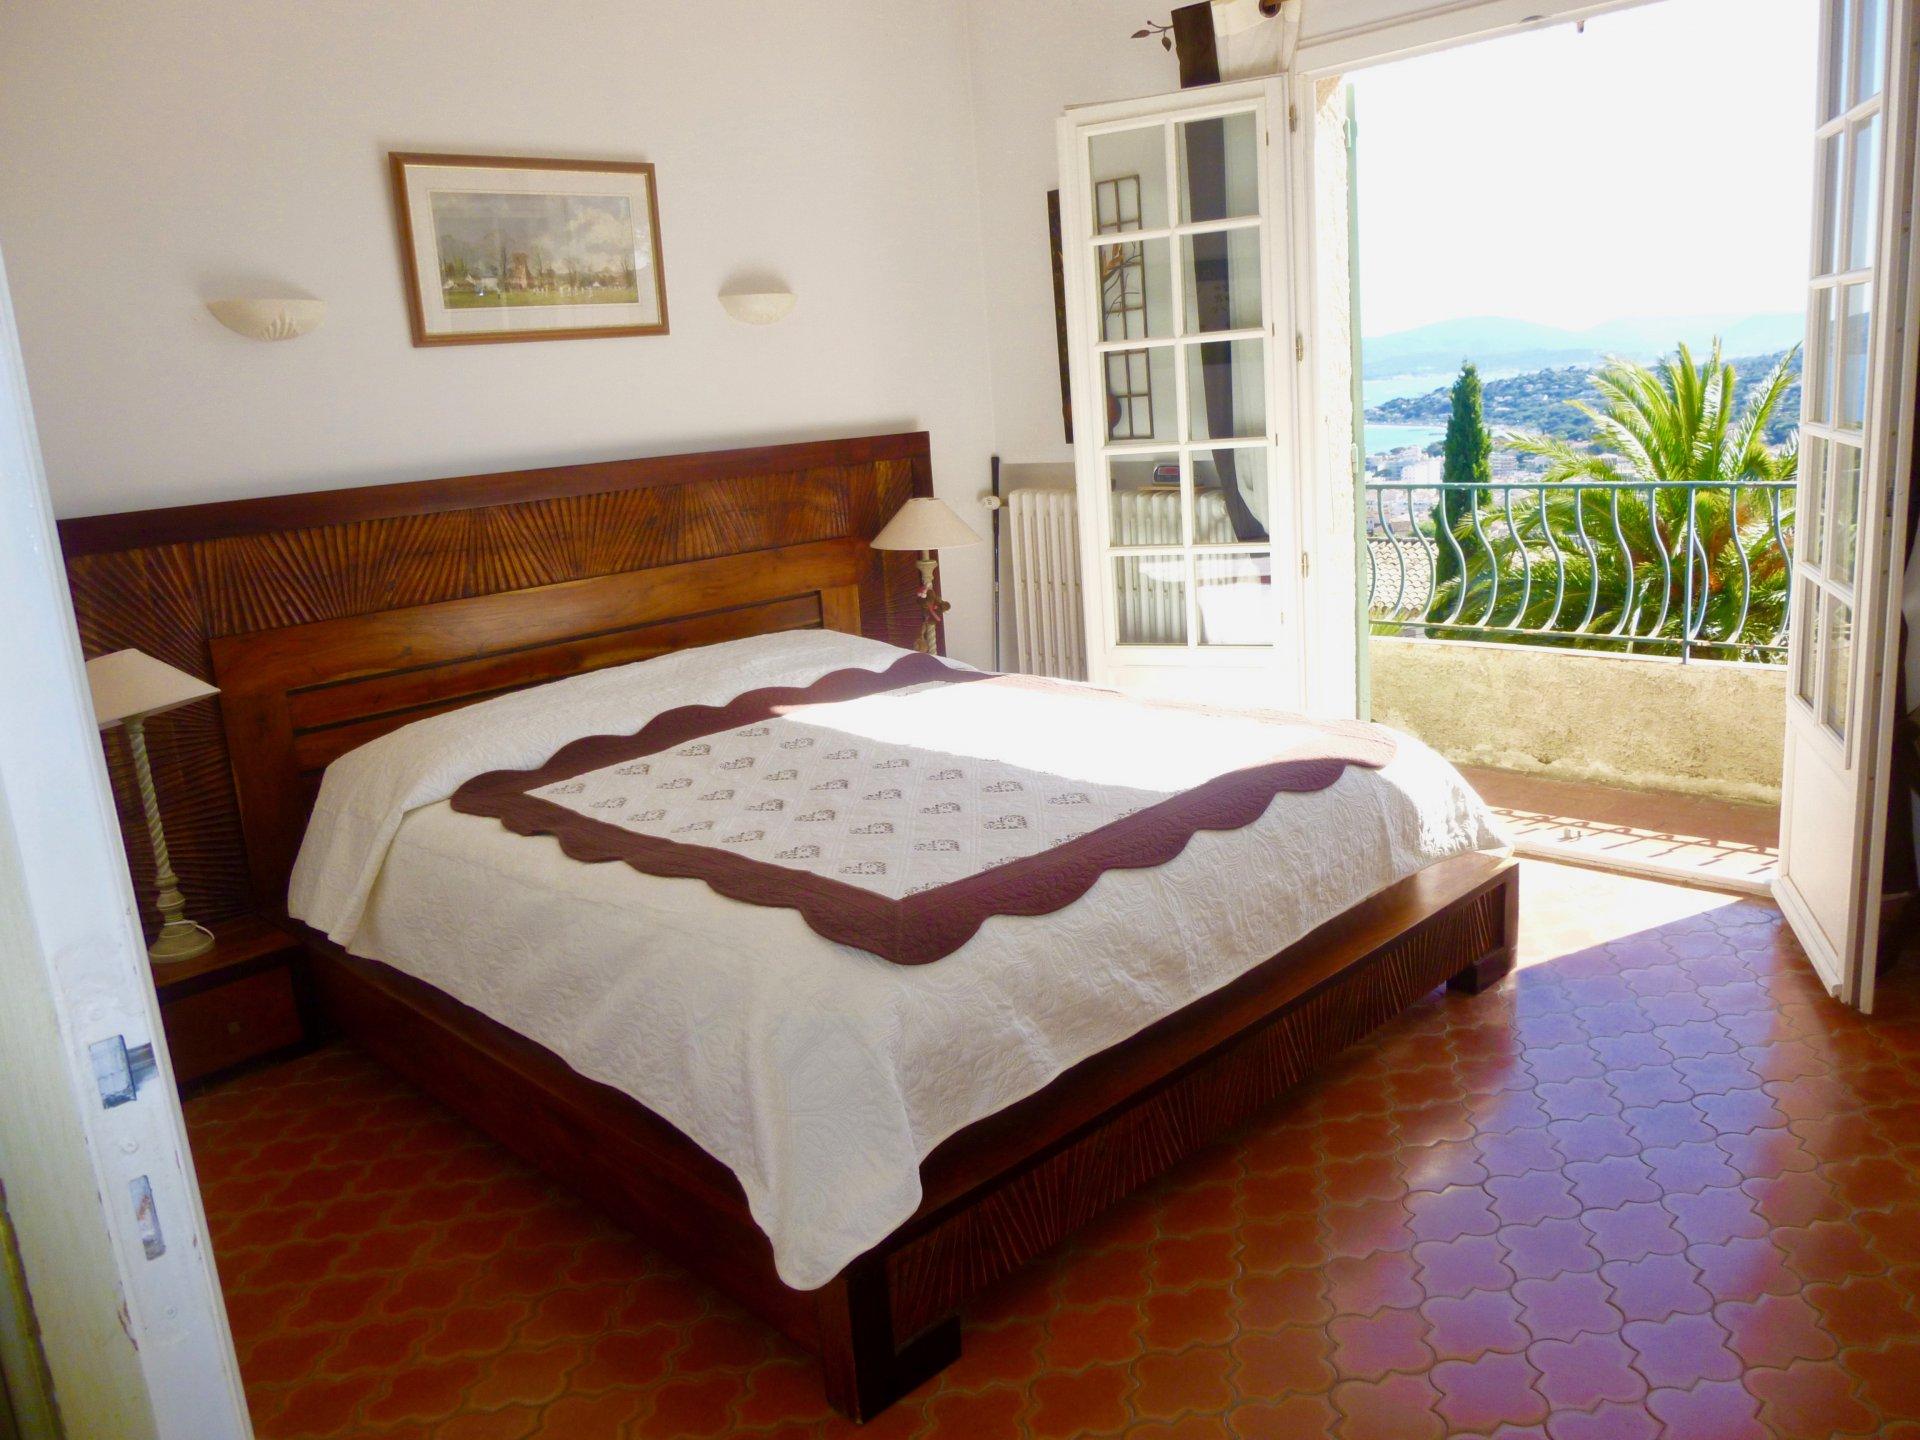 Villa for sale in Sainte Maxime with superb sea view towards Saint Tropez